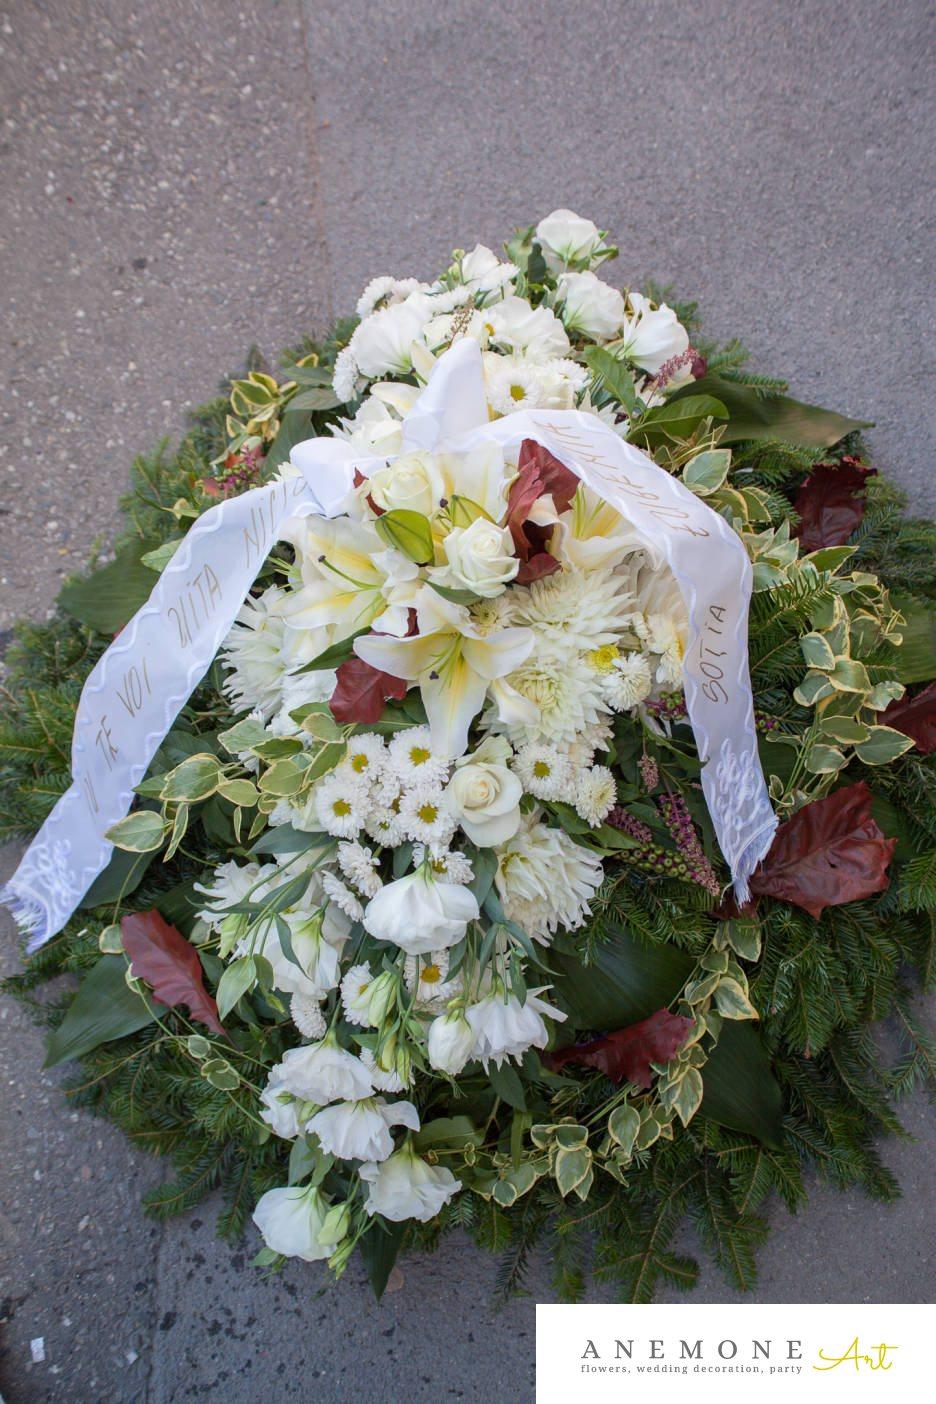 Poza, foto cu Flori de nunta alb, coroana funerara, crin, crizanteme, dalia, lisianthus, trandafiri in Arad, Timisoara, Oradea (wedding flowers, bouquets) nunta Arad, Timisoara, Oradea